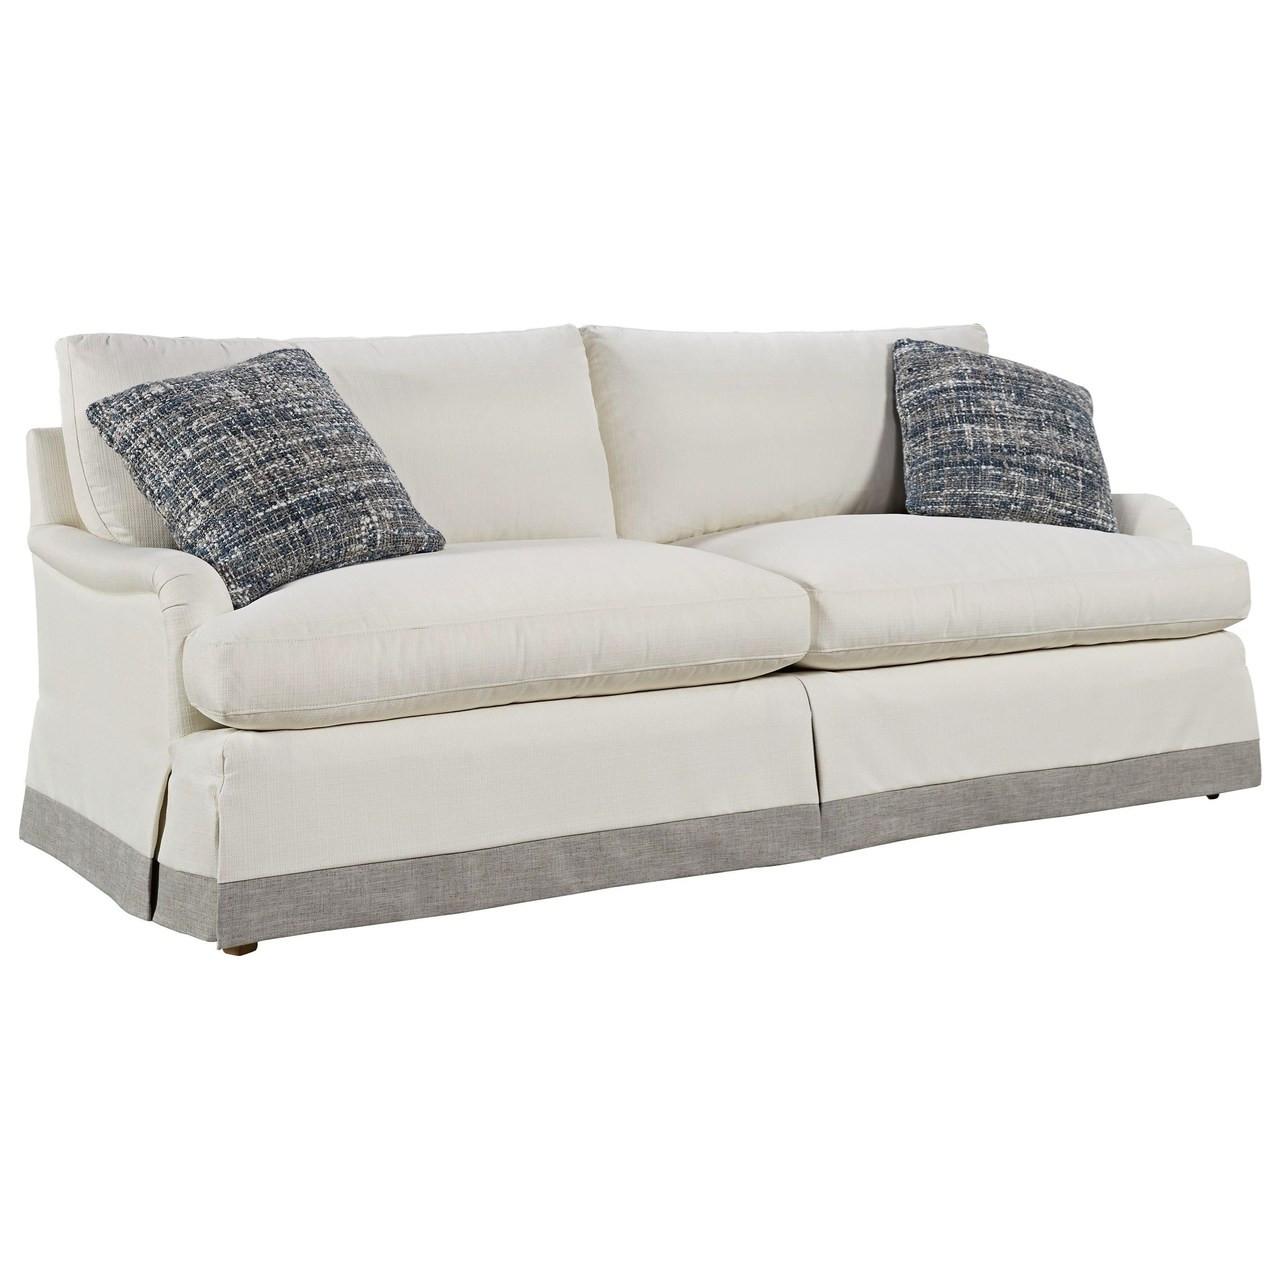 "English Roll Arm Sofa: Carmichael English Rolled Arm Skirted Sofa 89"""